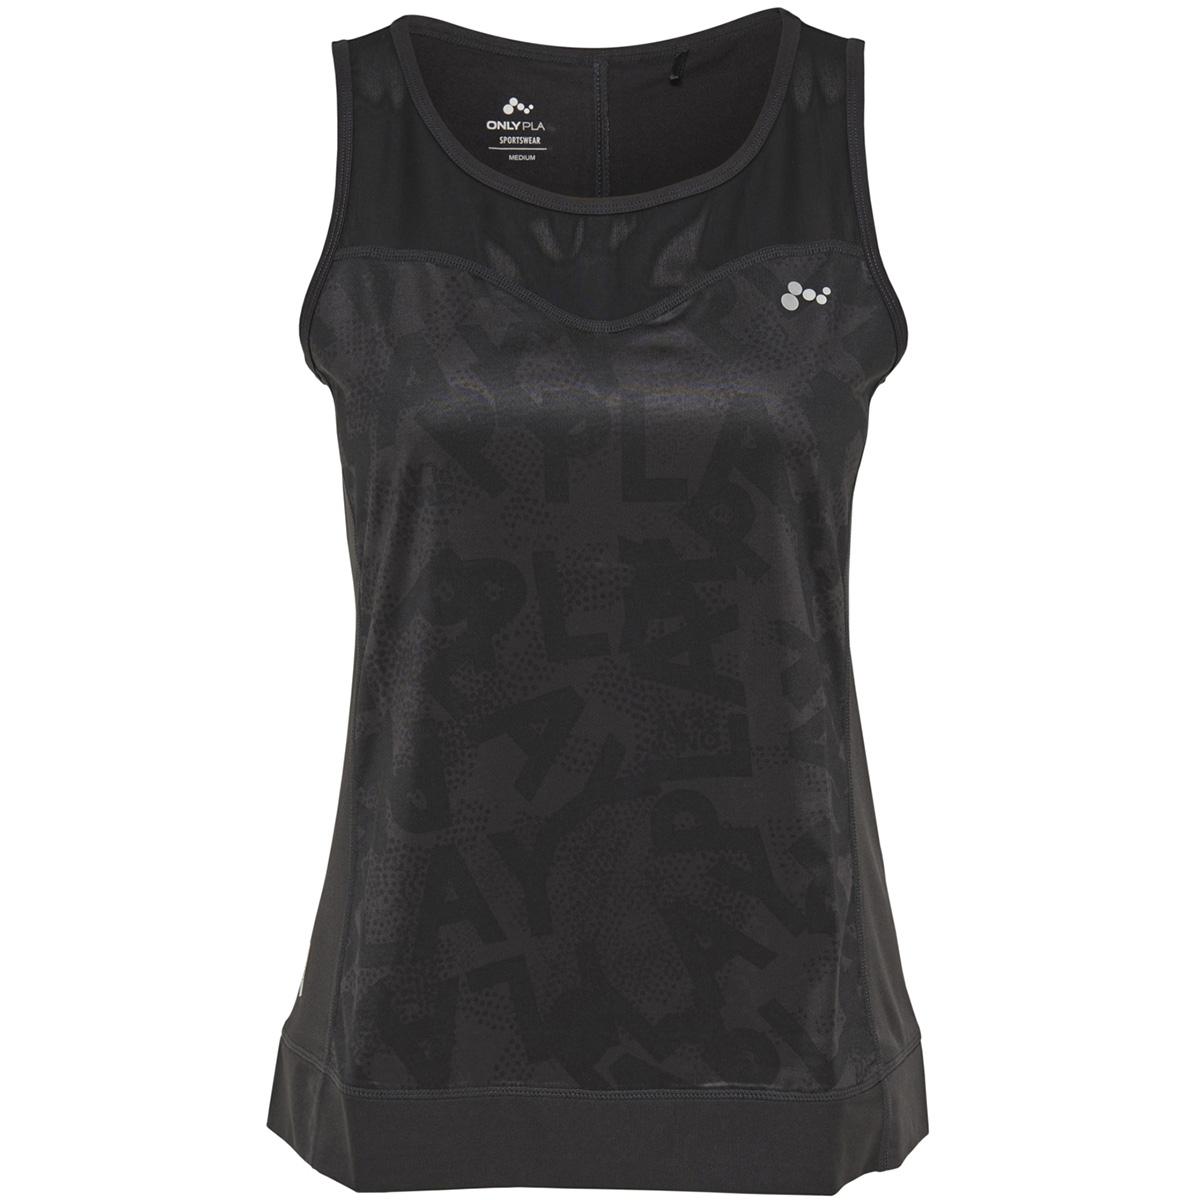 onpplay aop sl training top prs 15159702 only play sport top dark shadow